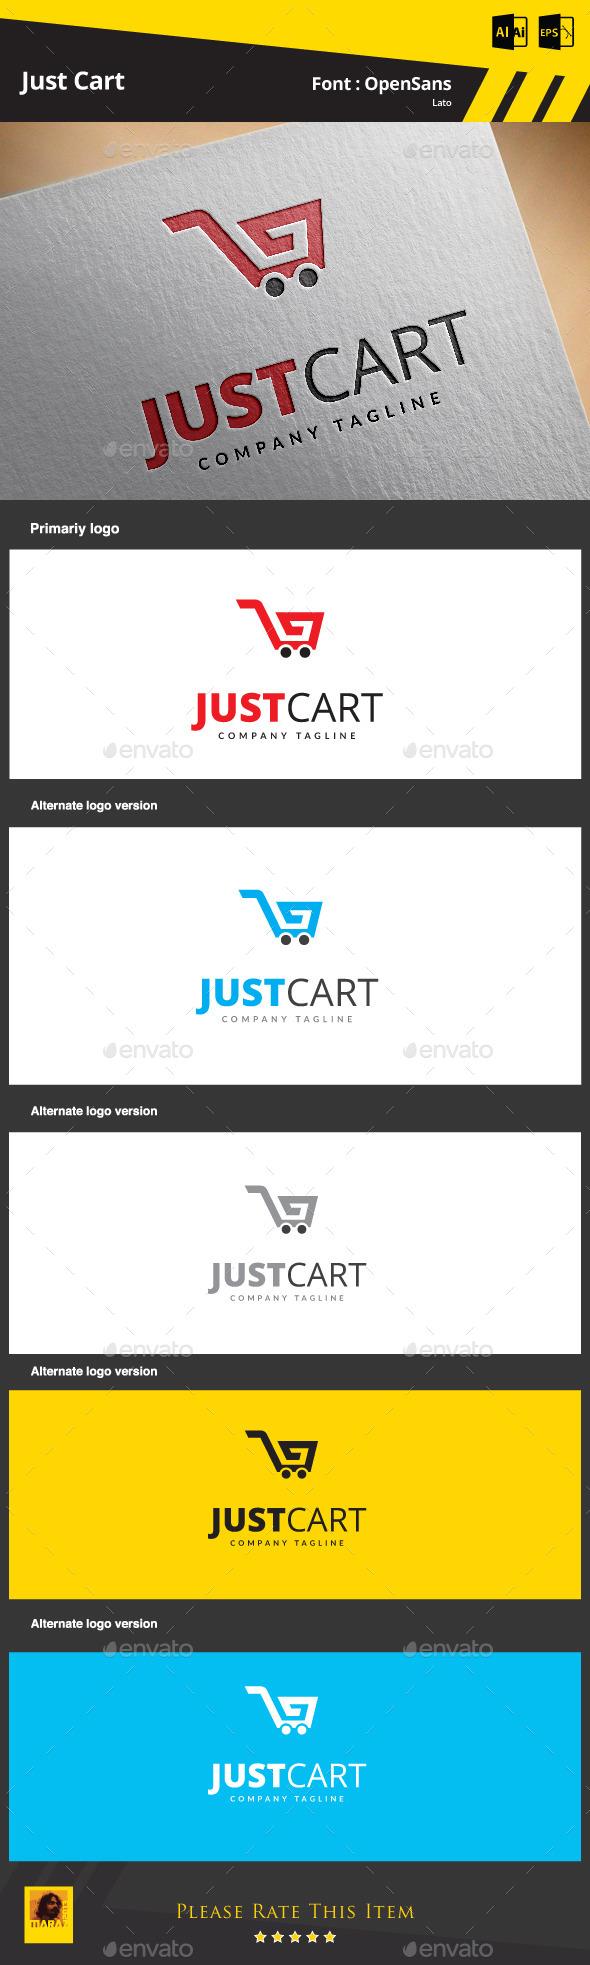 Just Cart